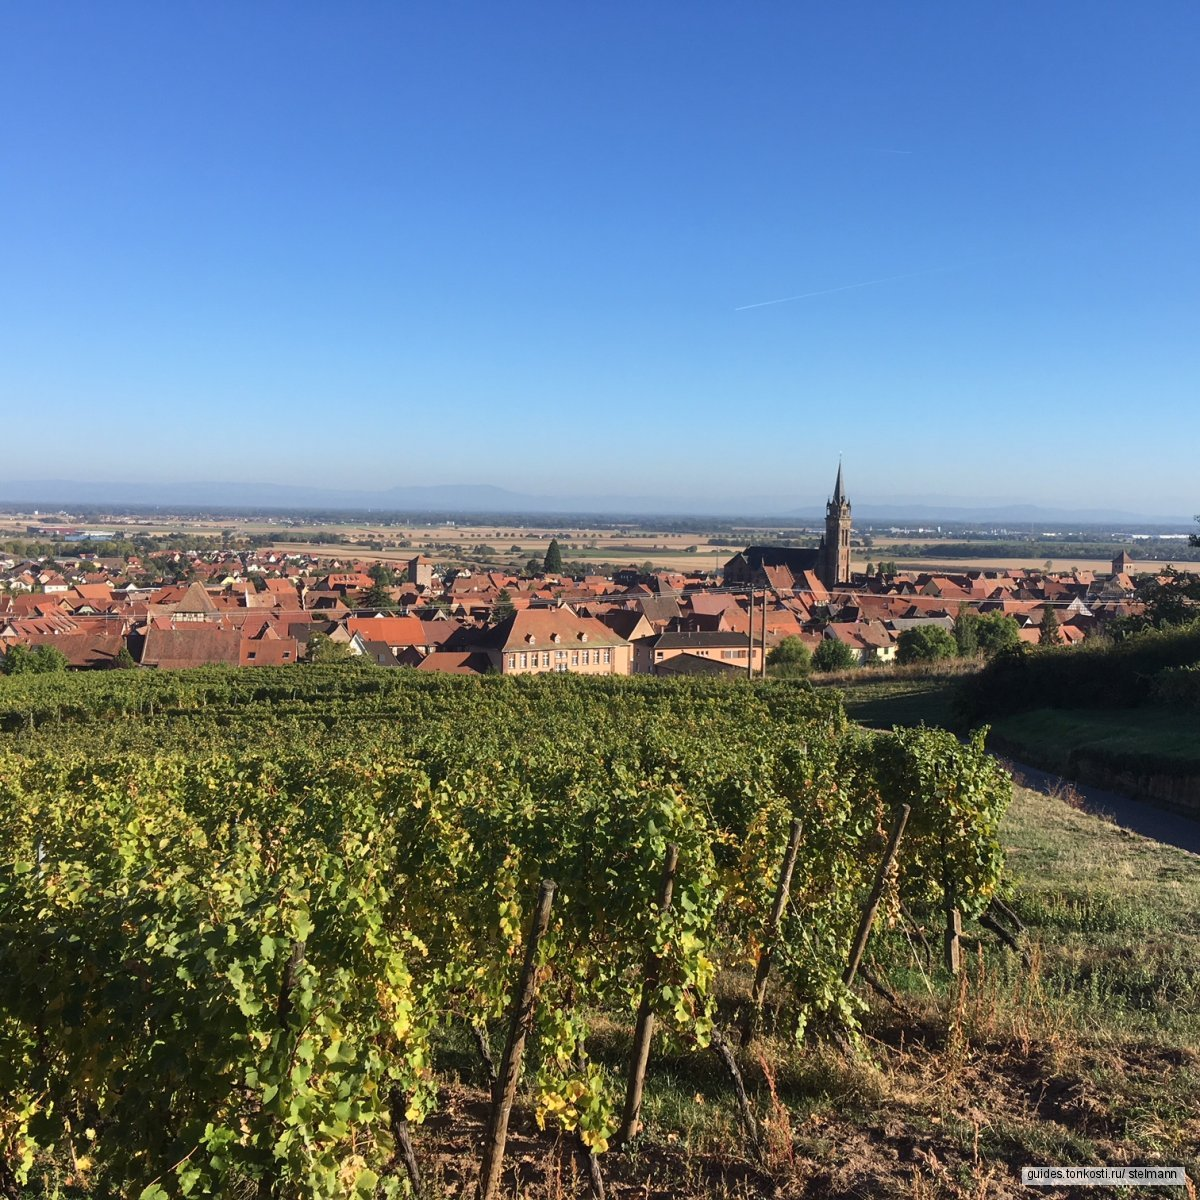 Винная дорога Эльзаса — Route des vins d'Alsace